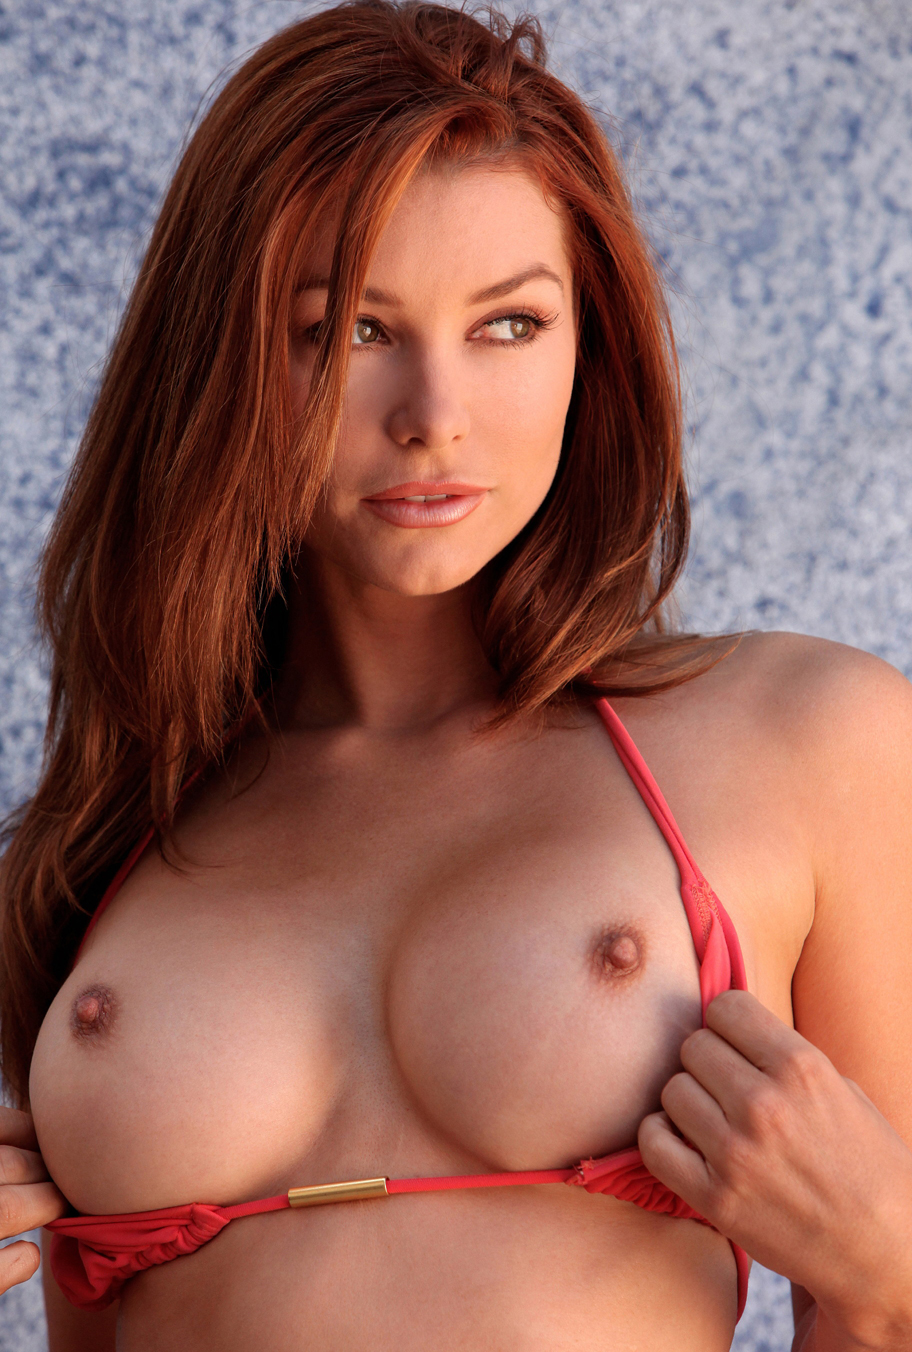 Sexy Pics that I Love: Titty McBoobs